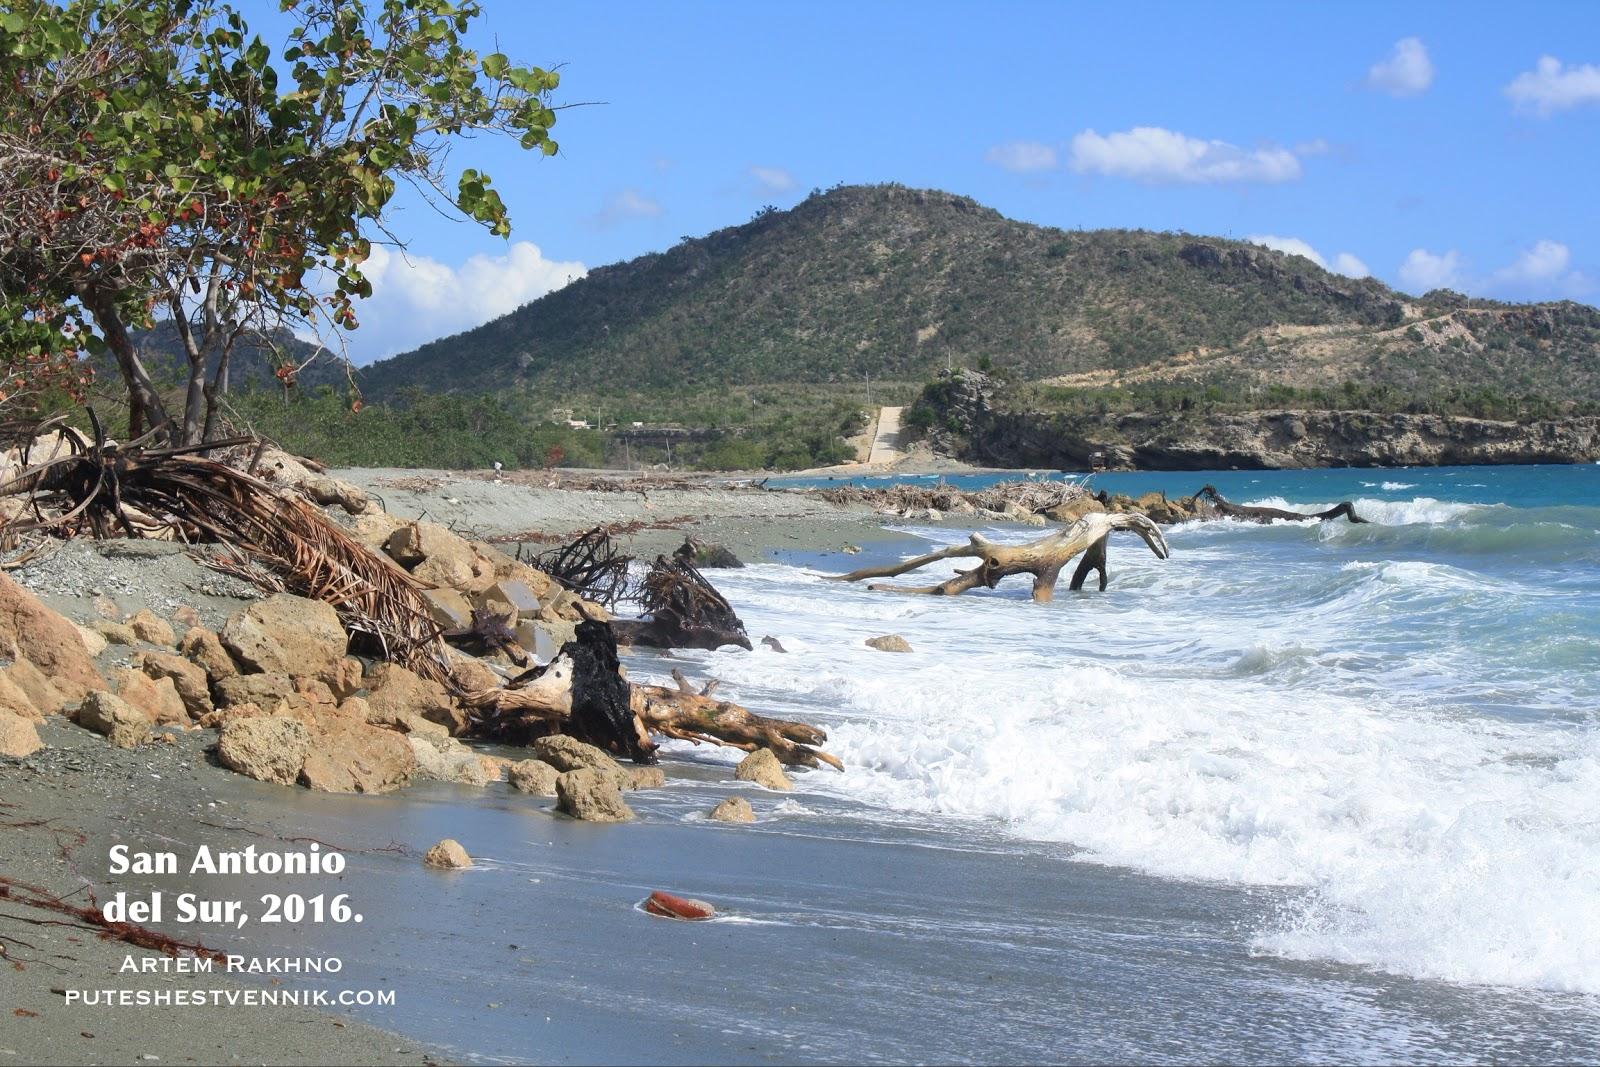 Кустарники и коряги на берегу Карибского моря